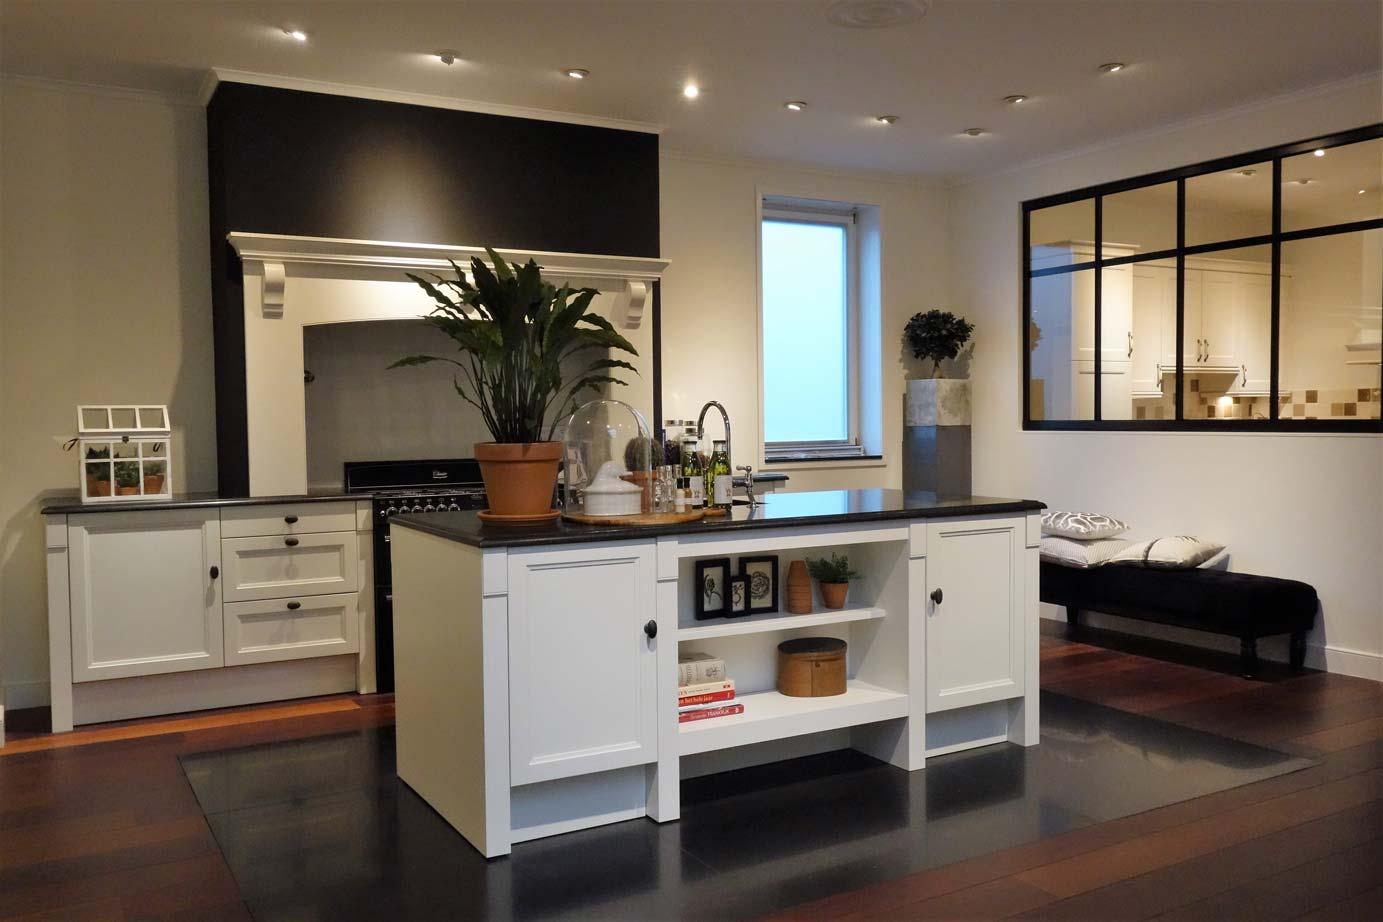 Keukeneiland T Opstelling : Kookeiland u keukeneiland veelzijdig handig keur